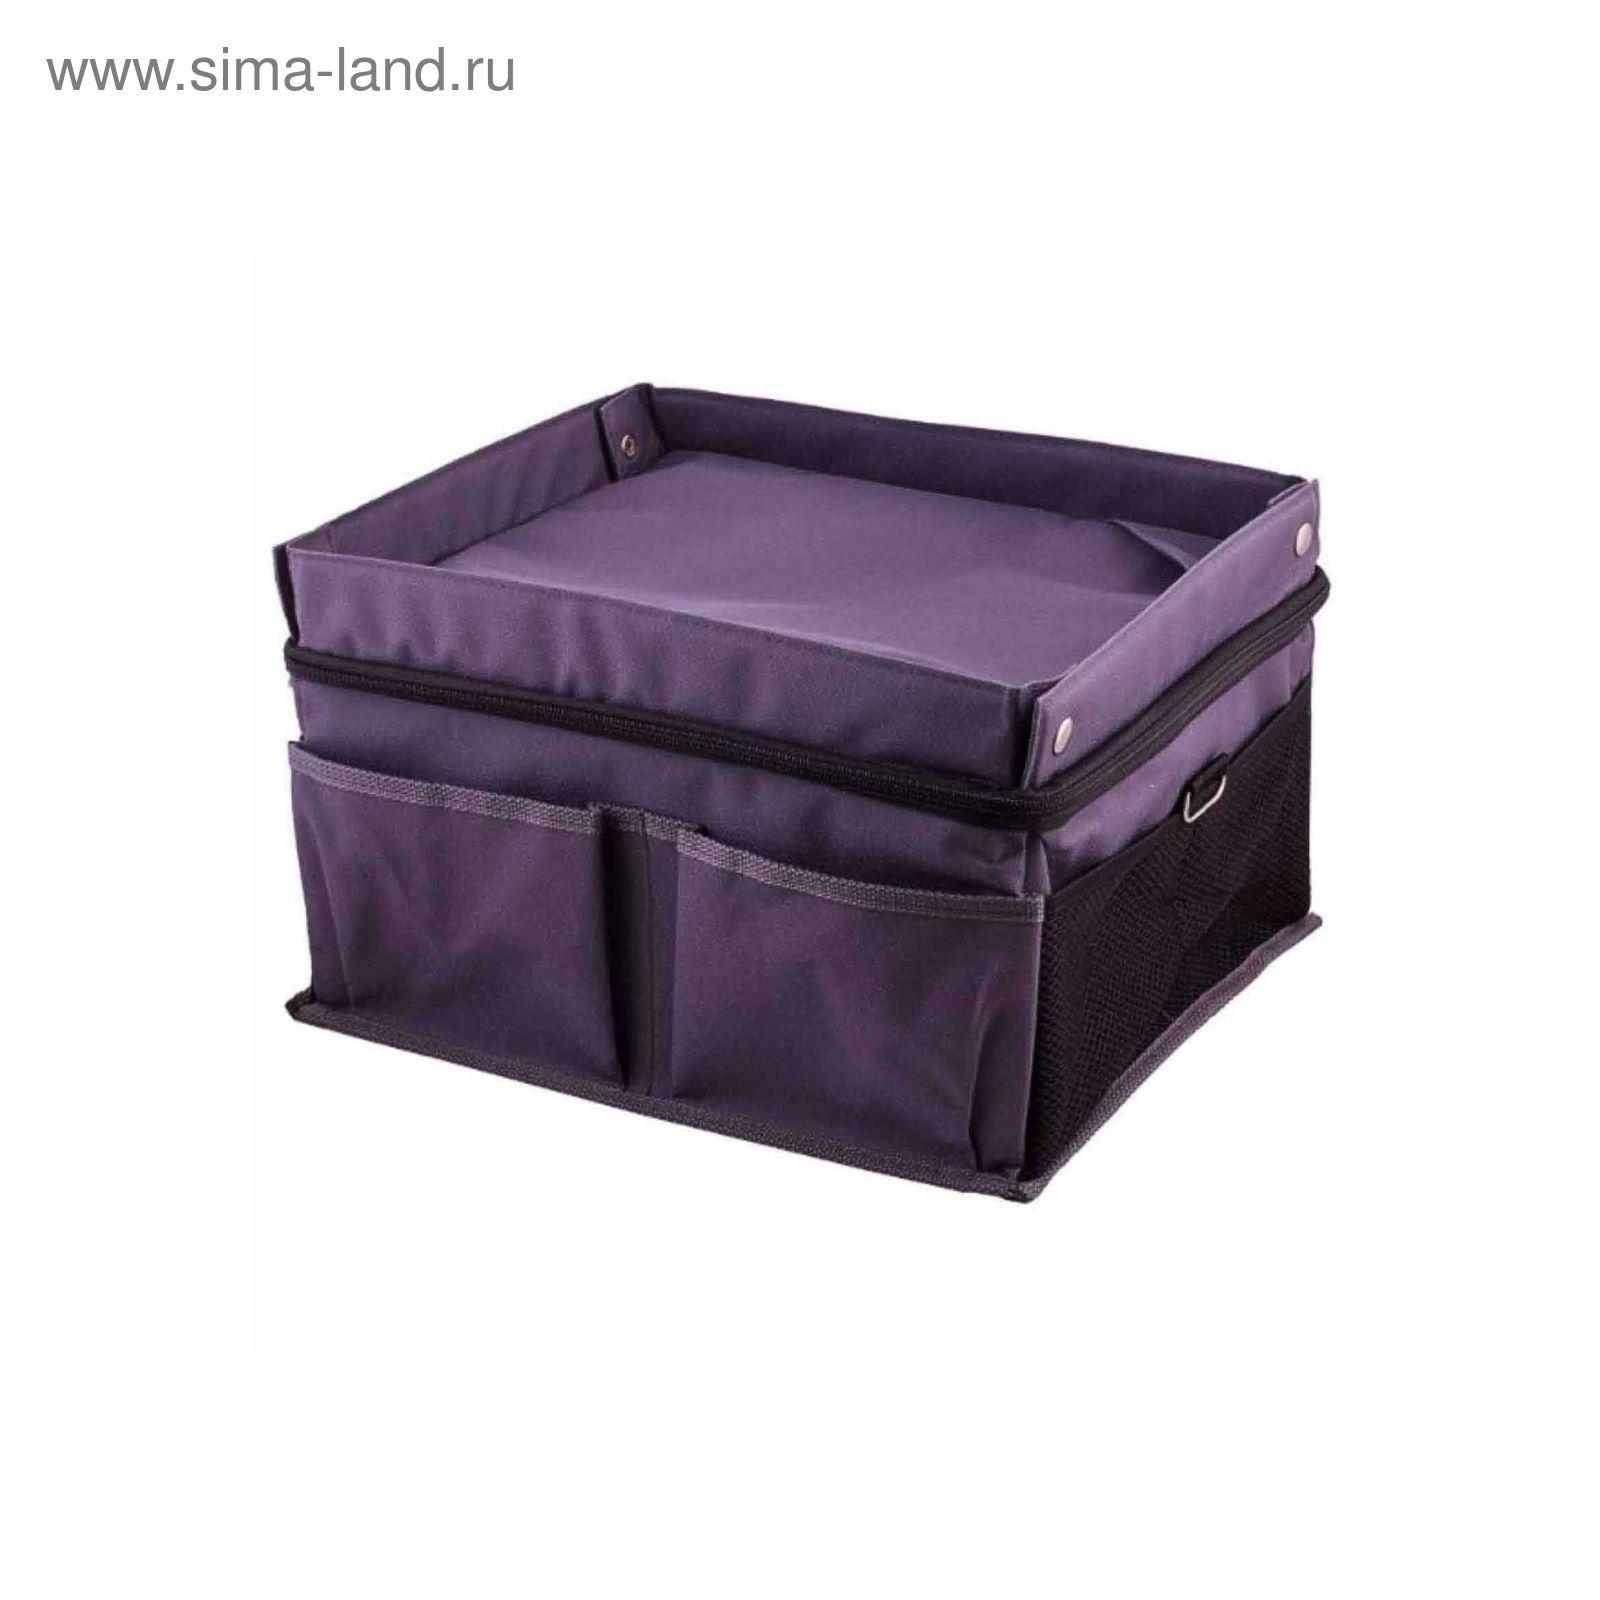 7b0edd9254bd Органайзер SKYWAY, 35х29х17см, серый сумка (2613398) - Купить по ...